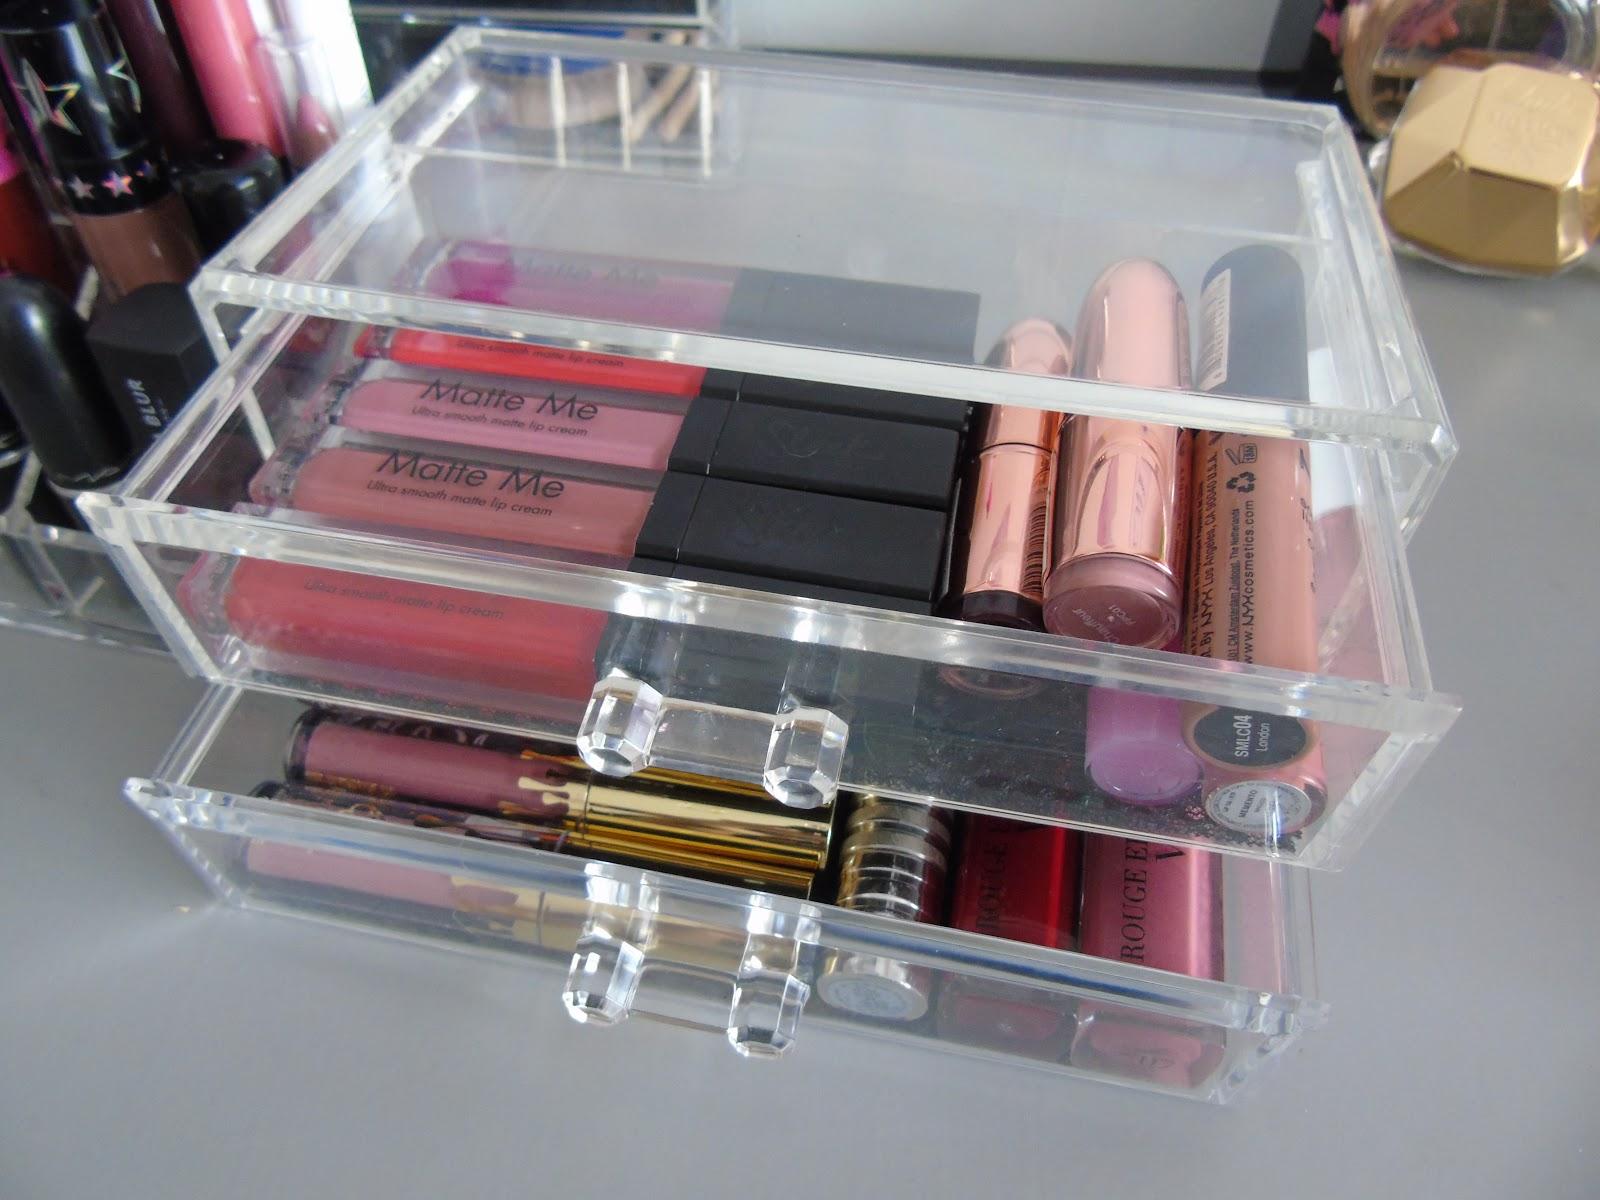 jeezlouisexo: Primark Makeup Storage Review